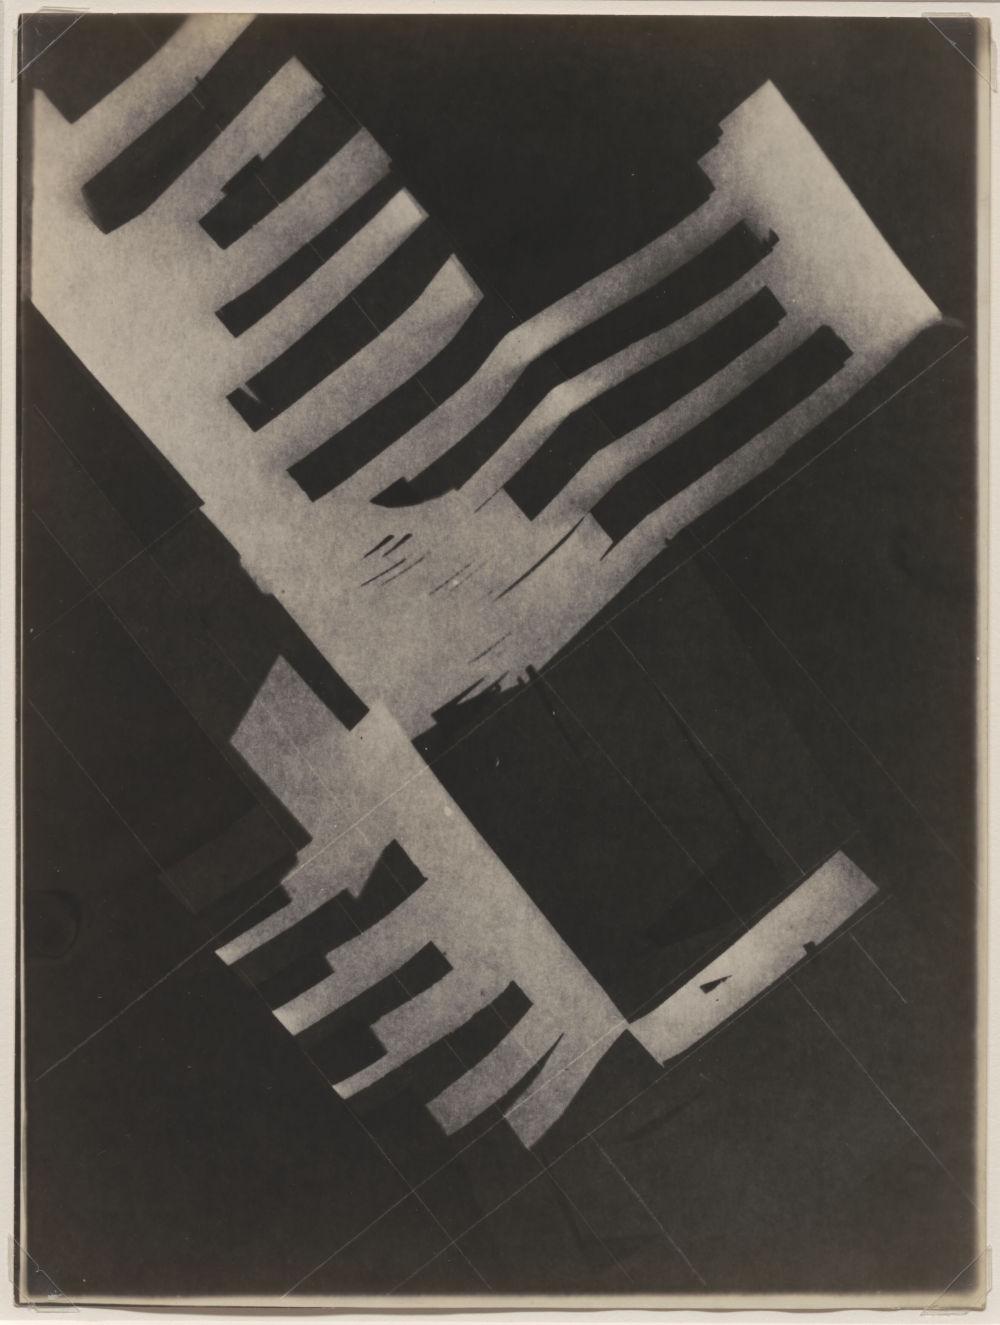 László Moholy-Nagy, Untitled (Cut paper like piano keys), 1925-1928. Photograph 23.6 x 17.7 cm / 9 1/4 x 7 in © the Estate of László Moholy-Nagy / Artists Rights Society (ARS), New York / VG Bild-Kunst, Bonn. Courtesy of the Estate of László Moholy-Nagy